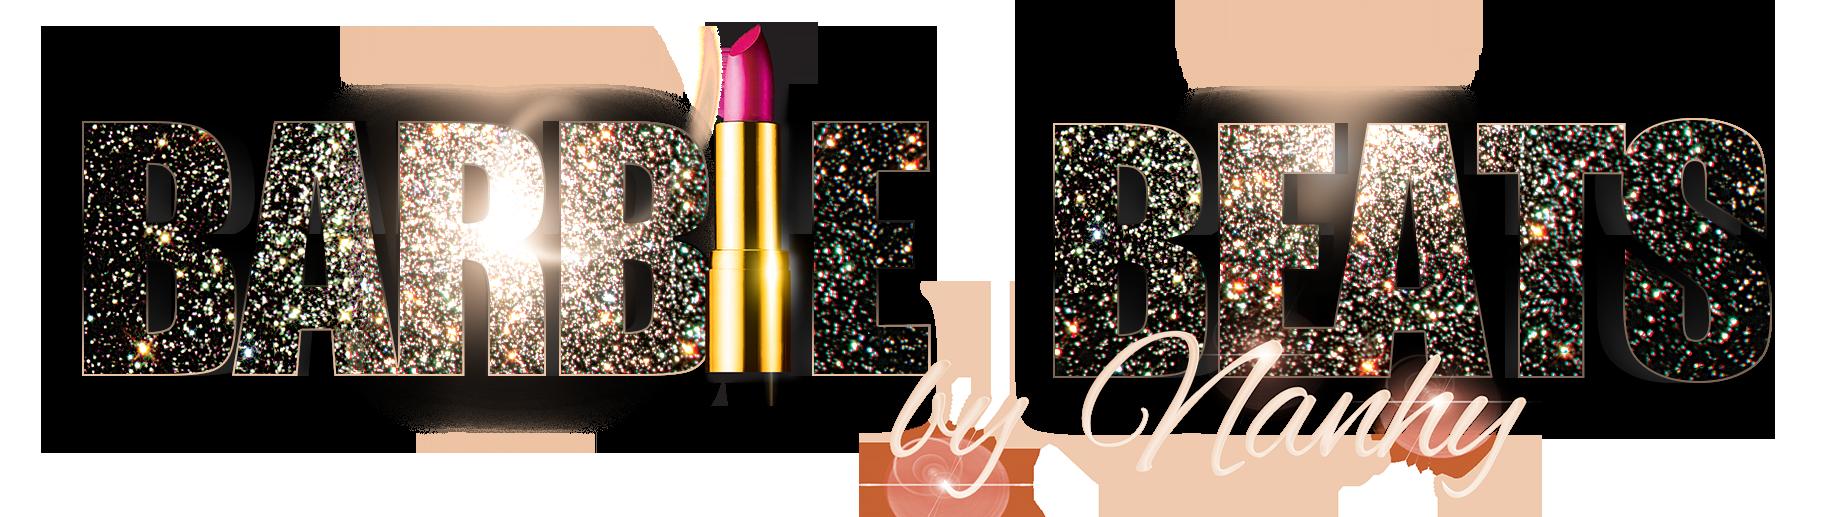 Brbie Beats by Nanhy blk glitter w lipstick.png